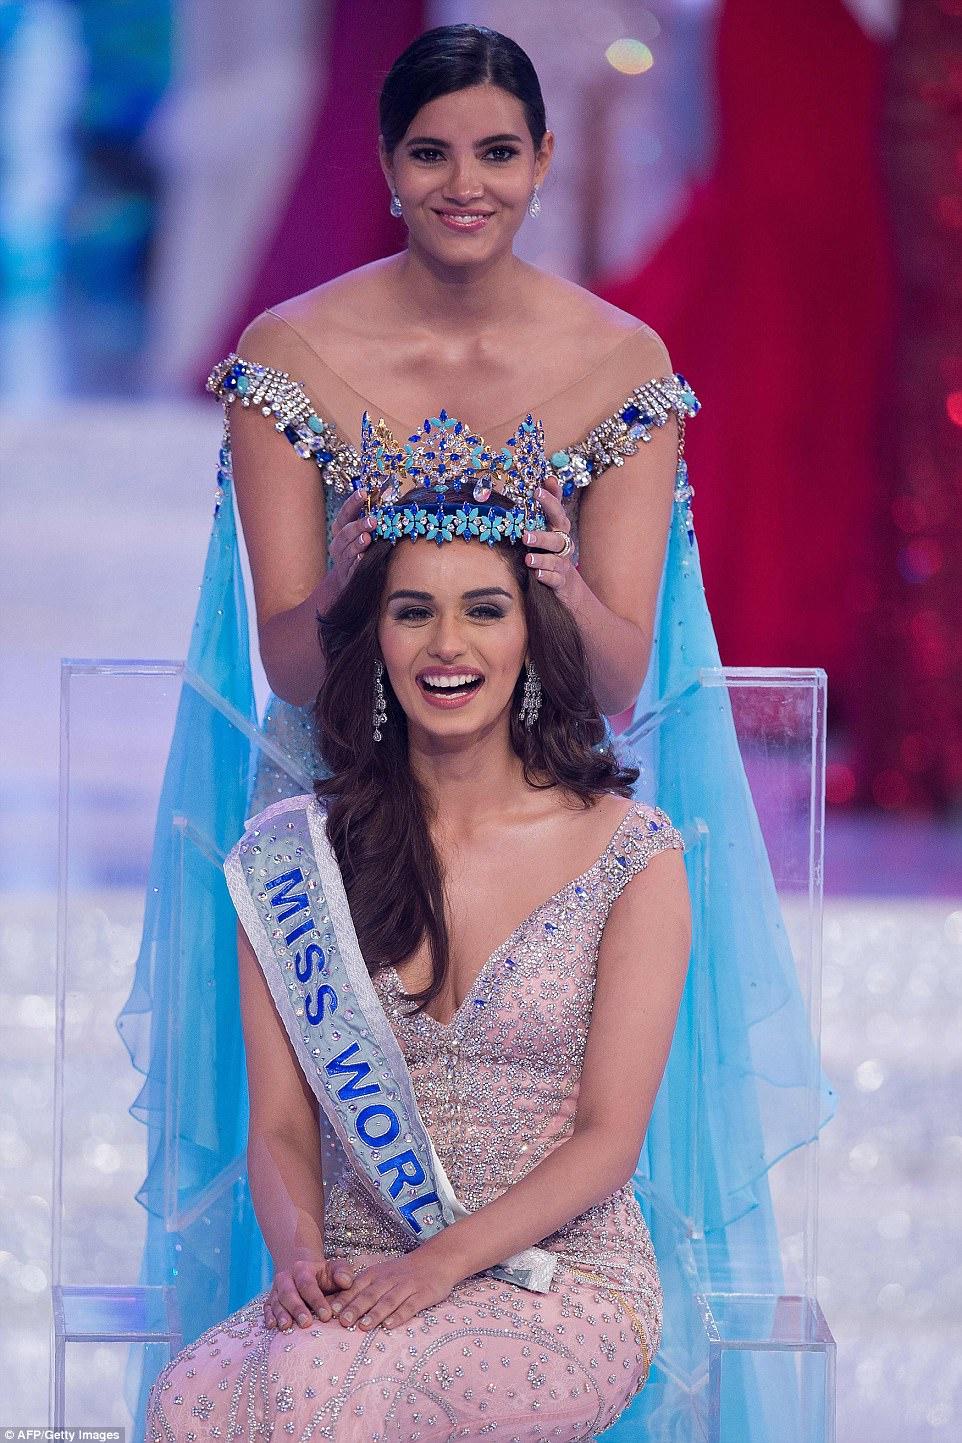 Стала известна победительница конкурса «Мисс Мира 2017» — фото